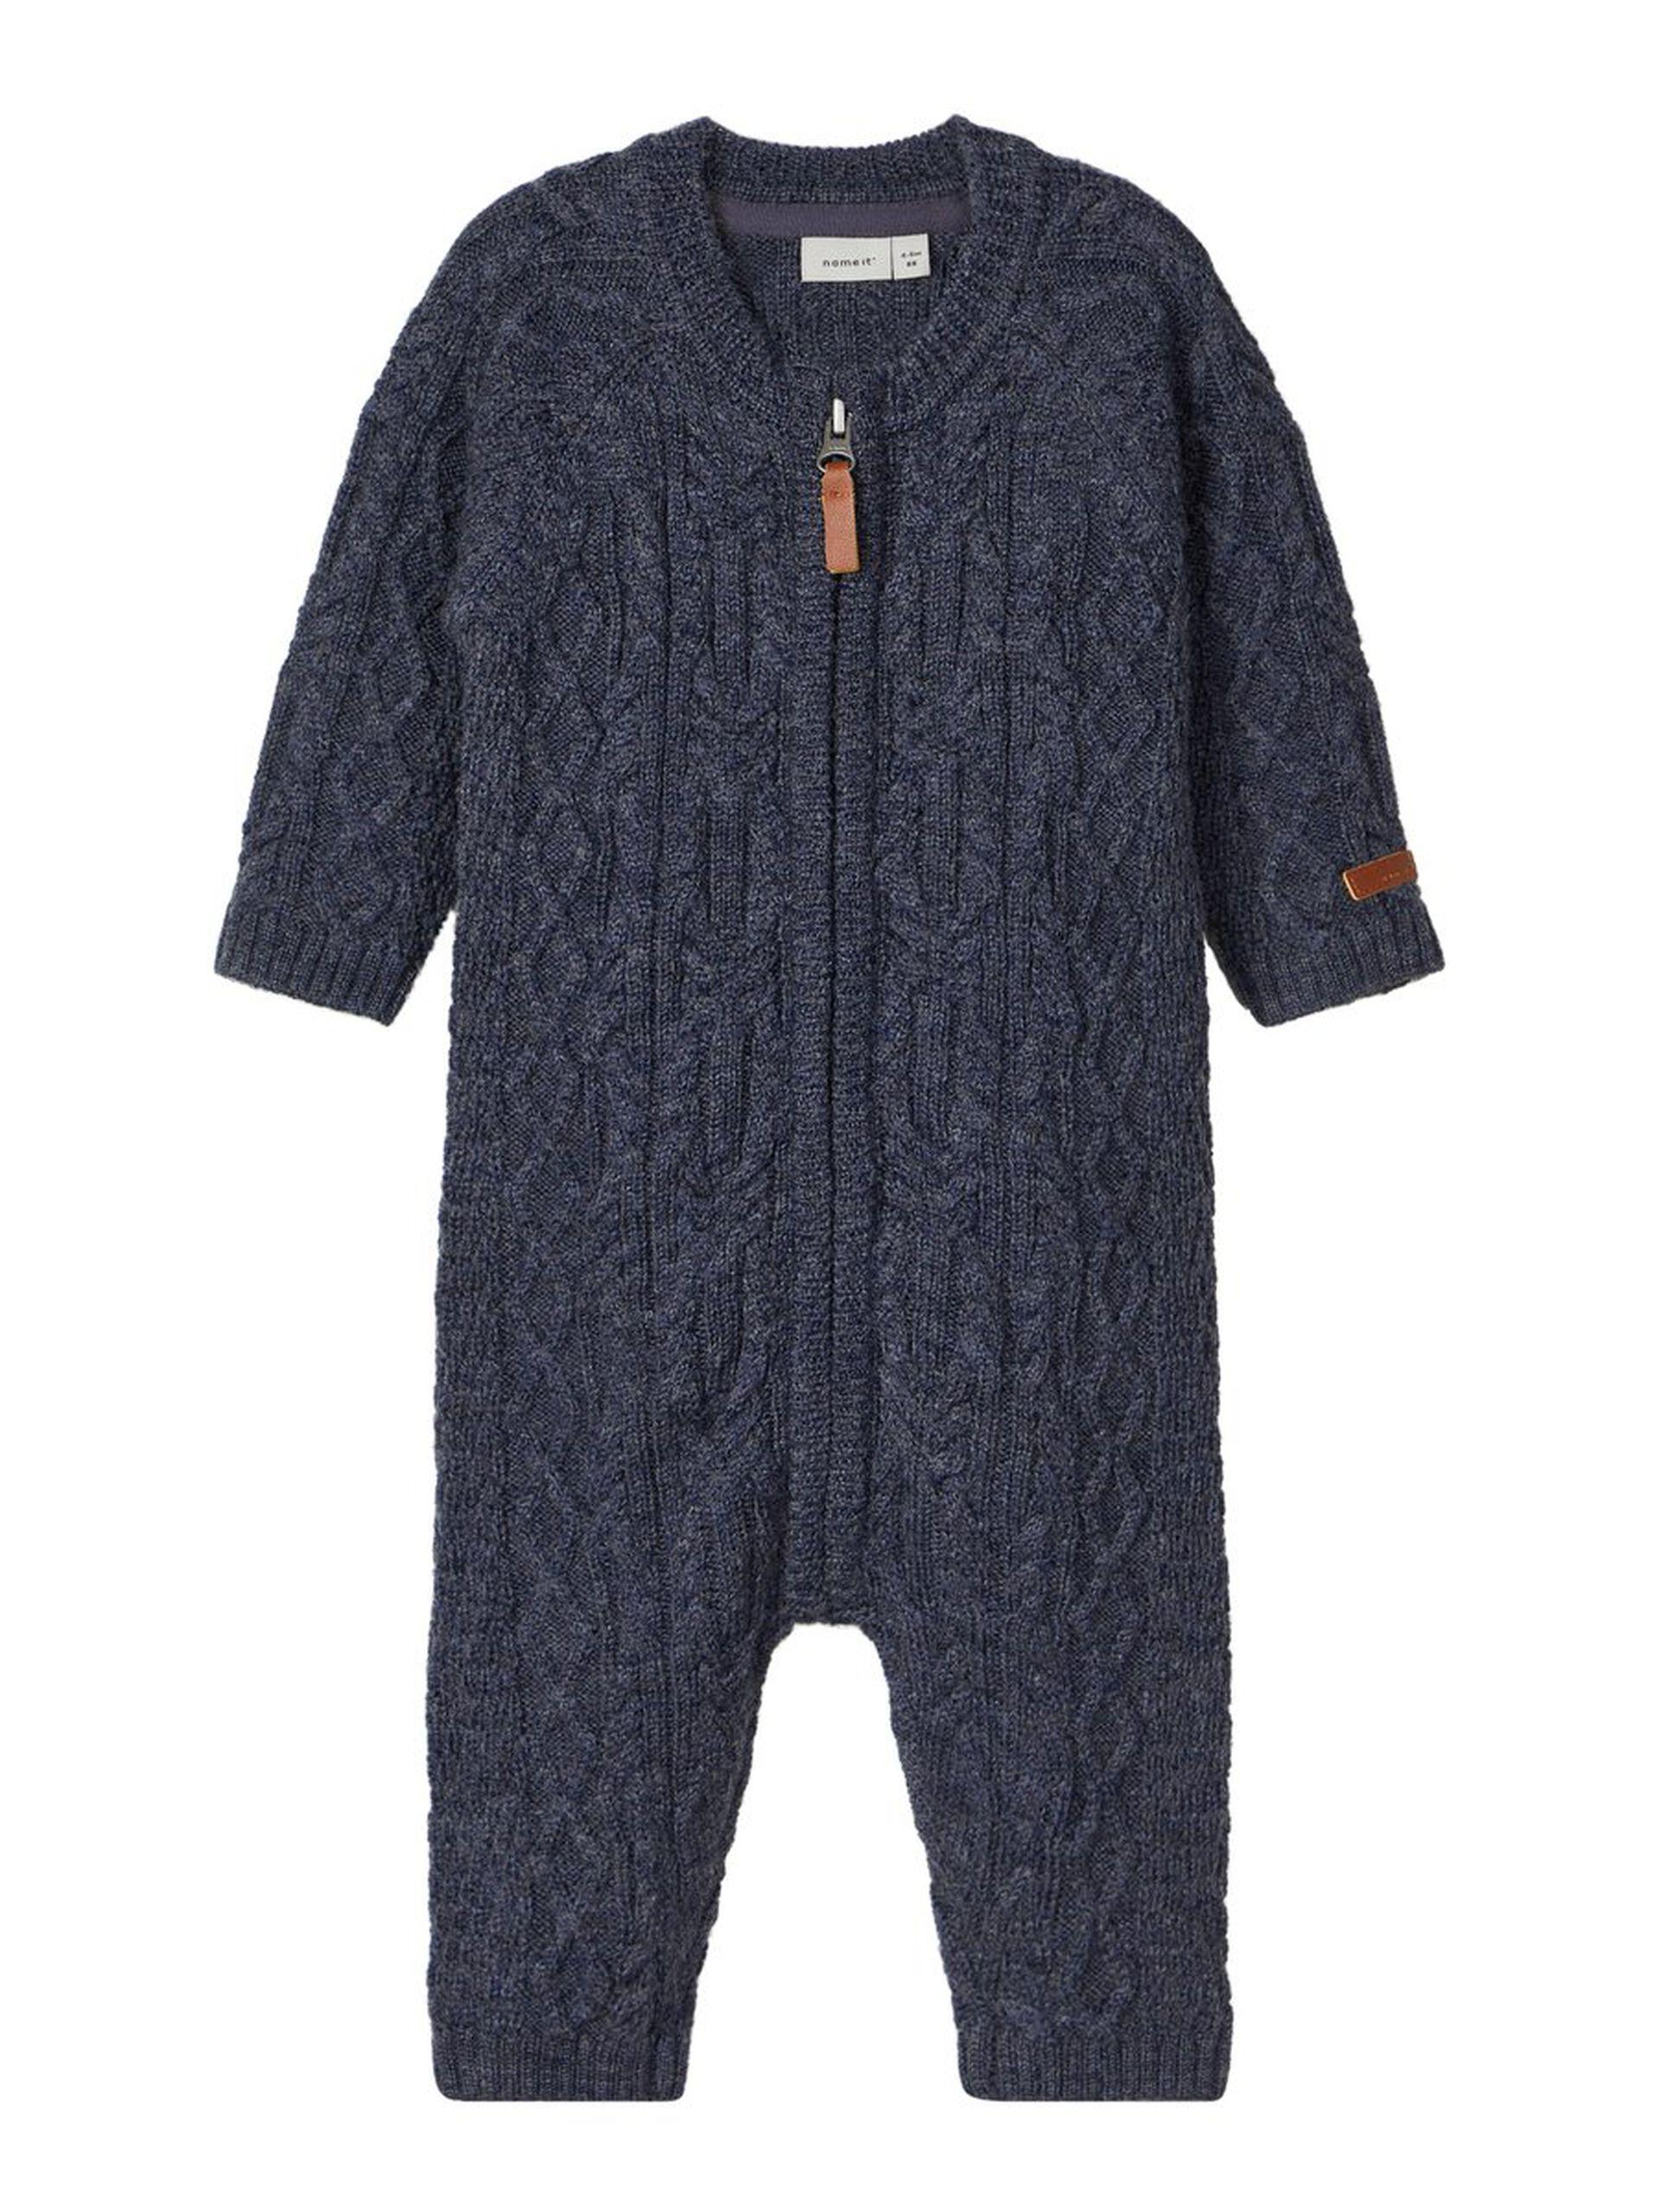 Blå ulldress baby – Ull blå ulldress baby Wrilla – Mio Trend